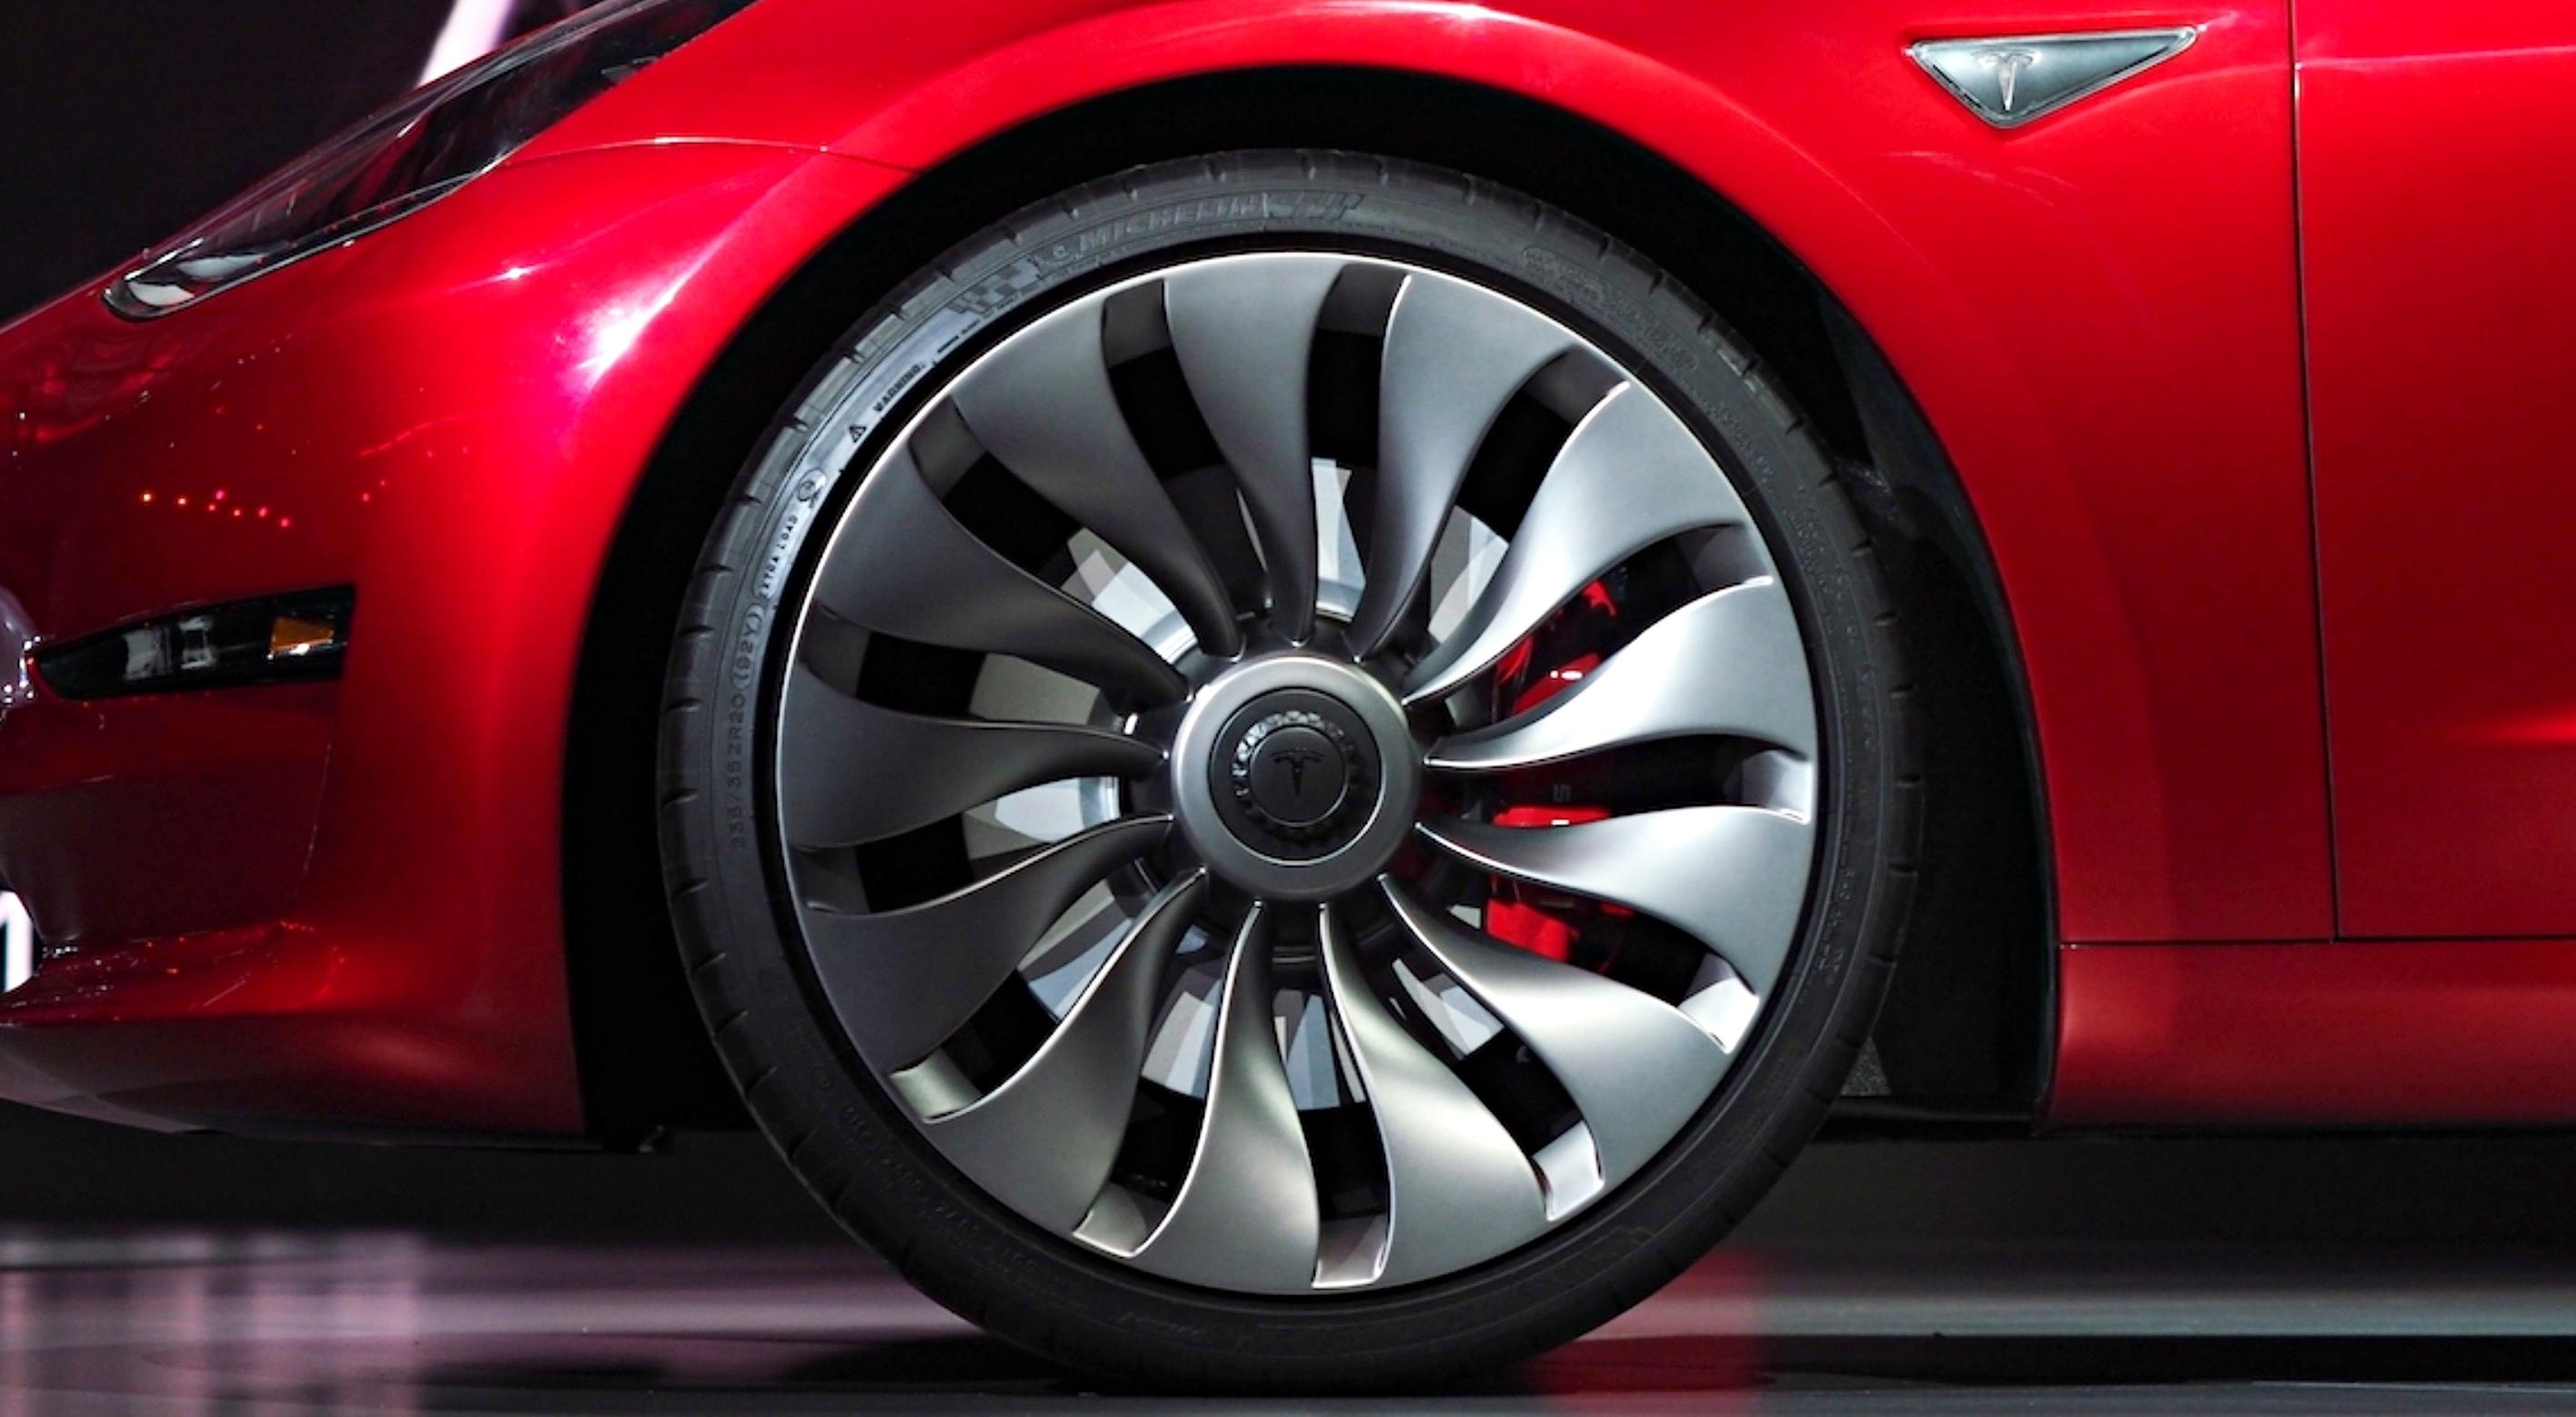 Tesla Model 3 Wheels 20 Inch Michelin Tires Teslarati